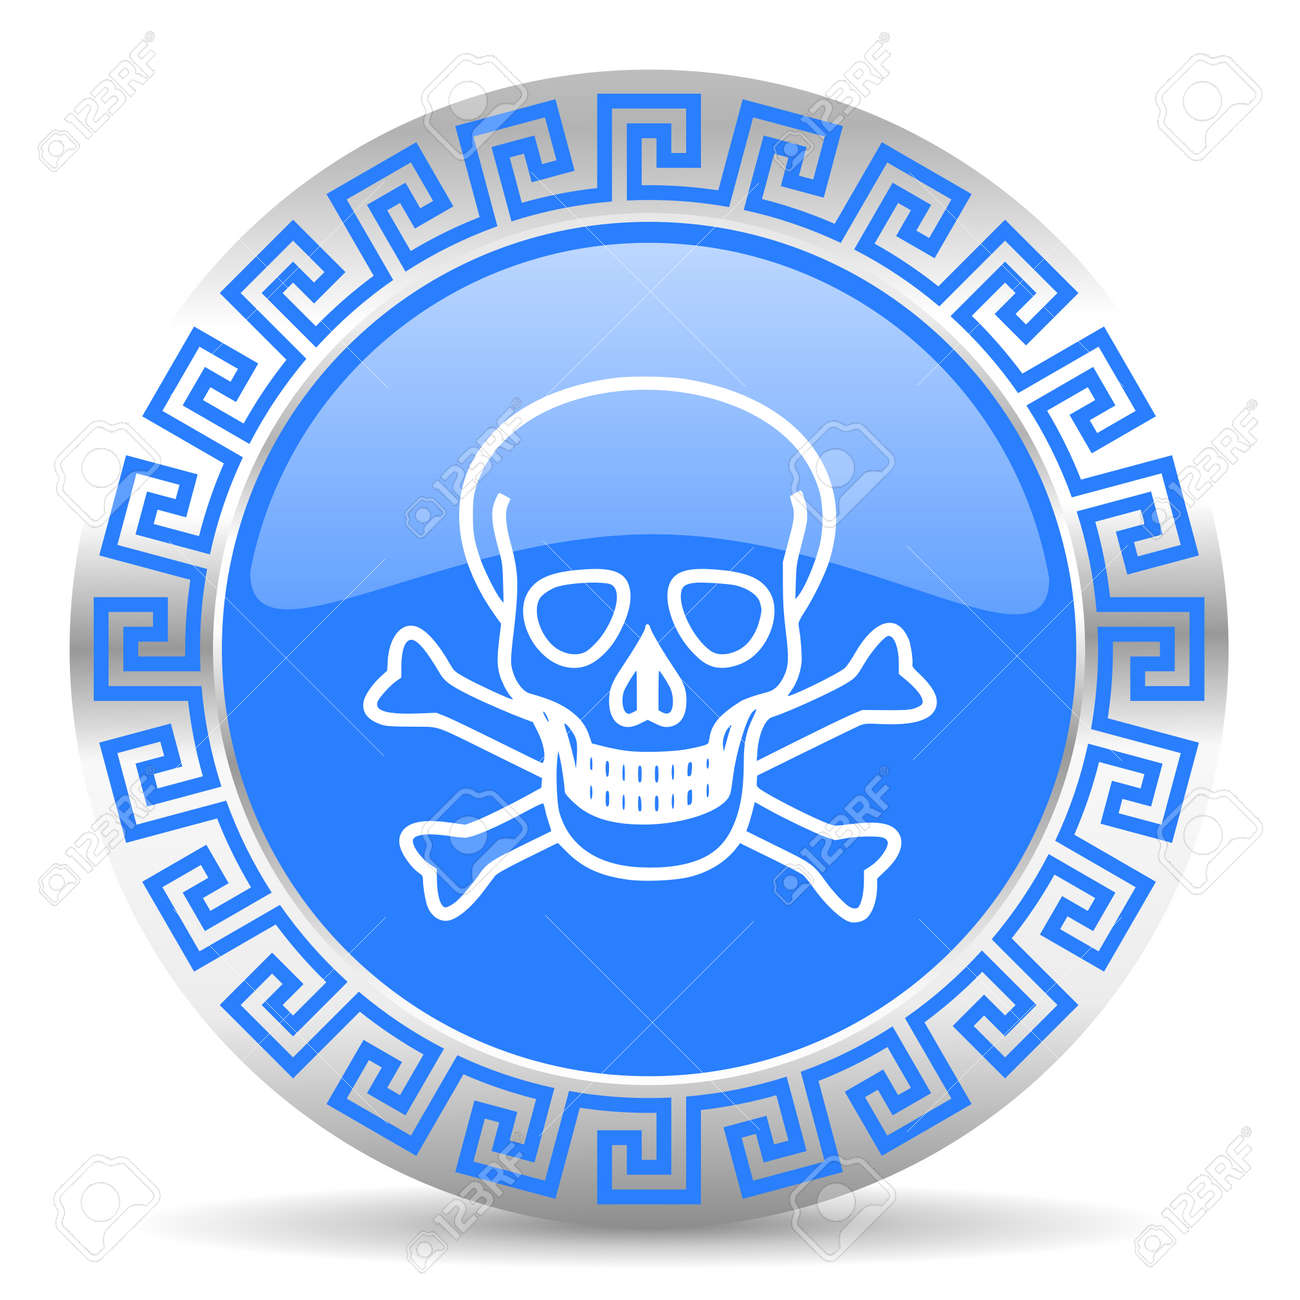 blue circle web button Stock Photo - 26026896